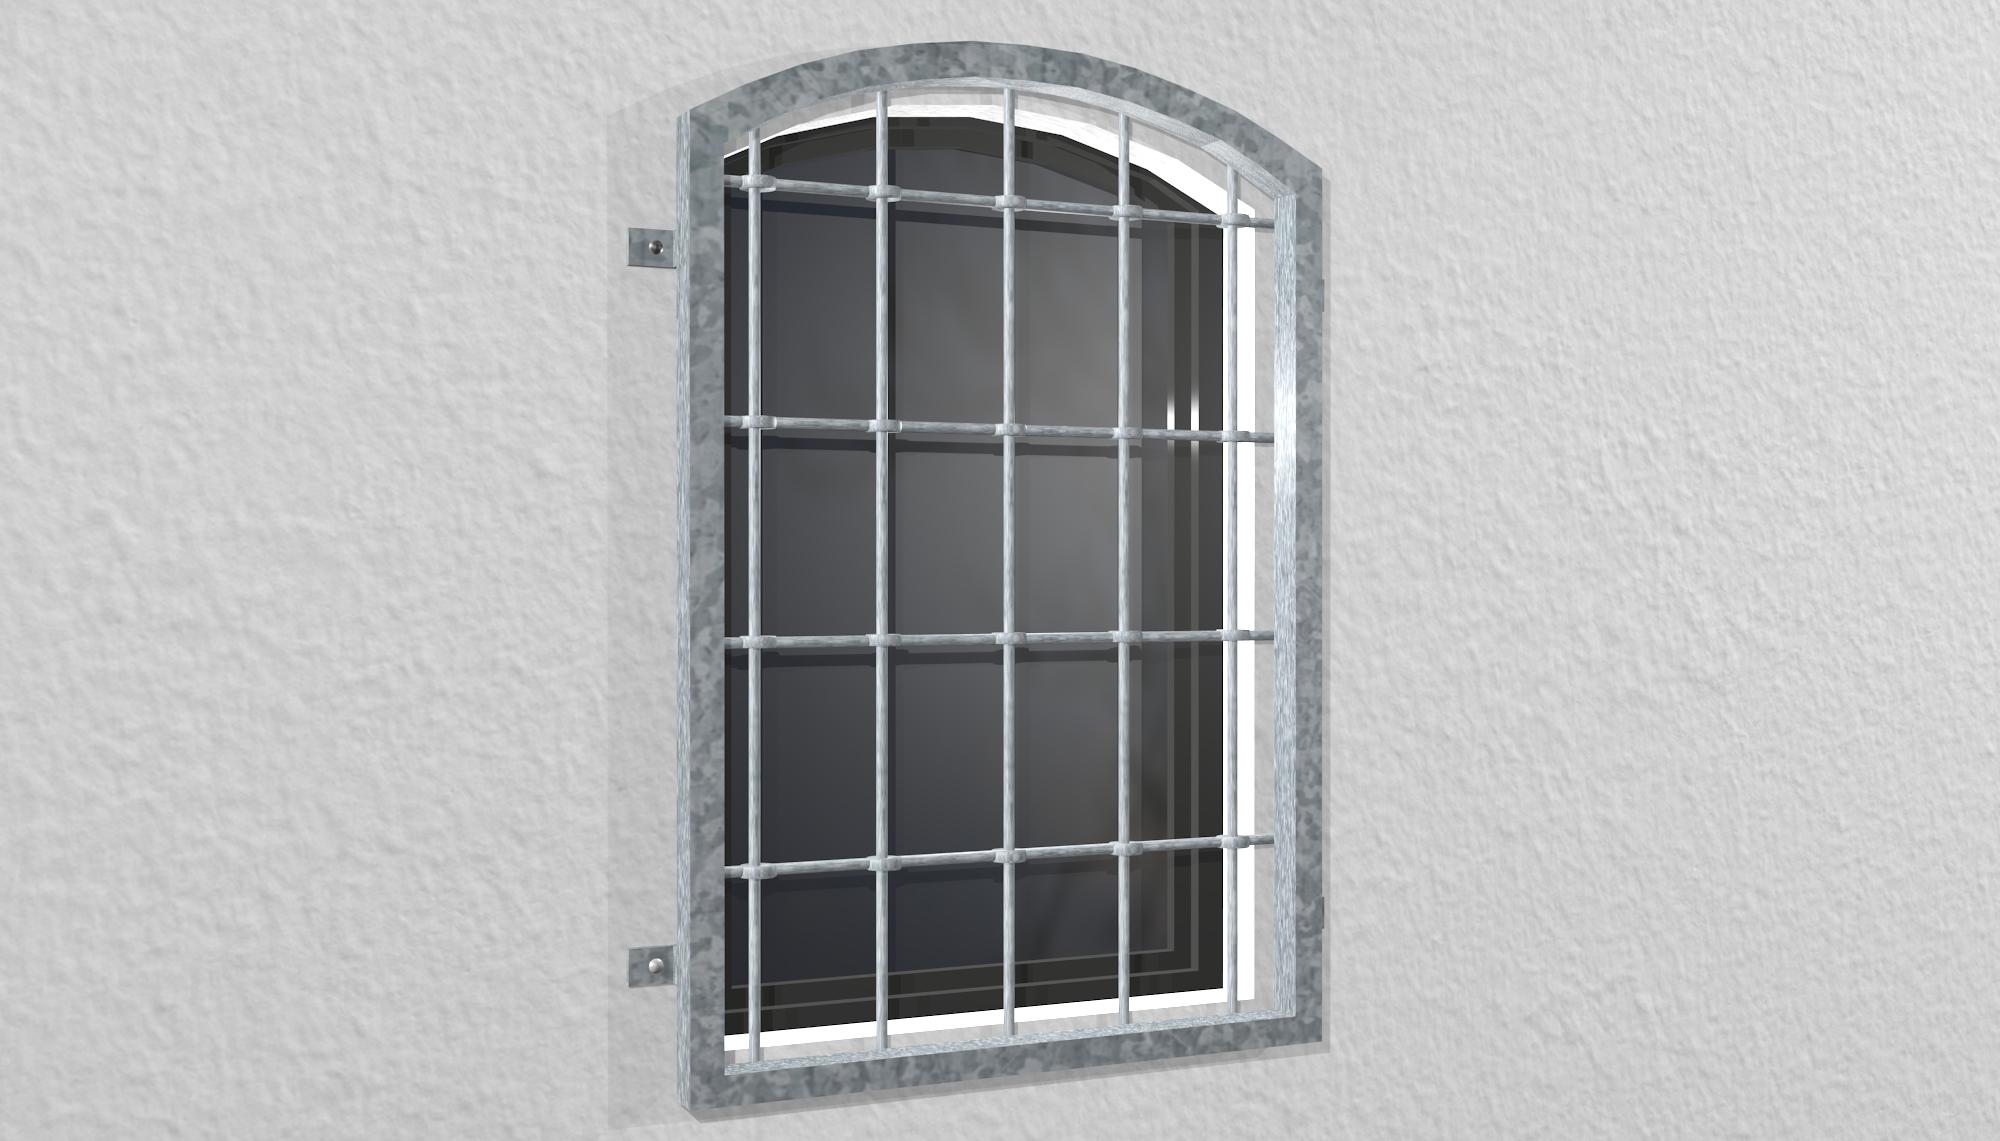 Fenstergitter verzinkt Rundstab Oberbogen